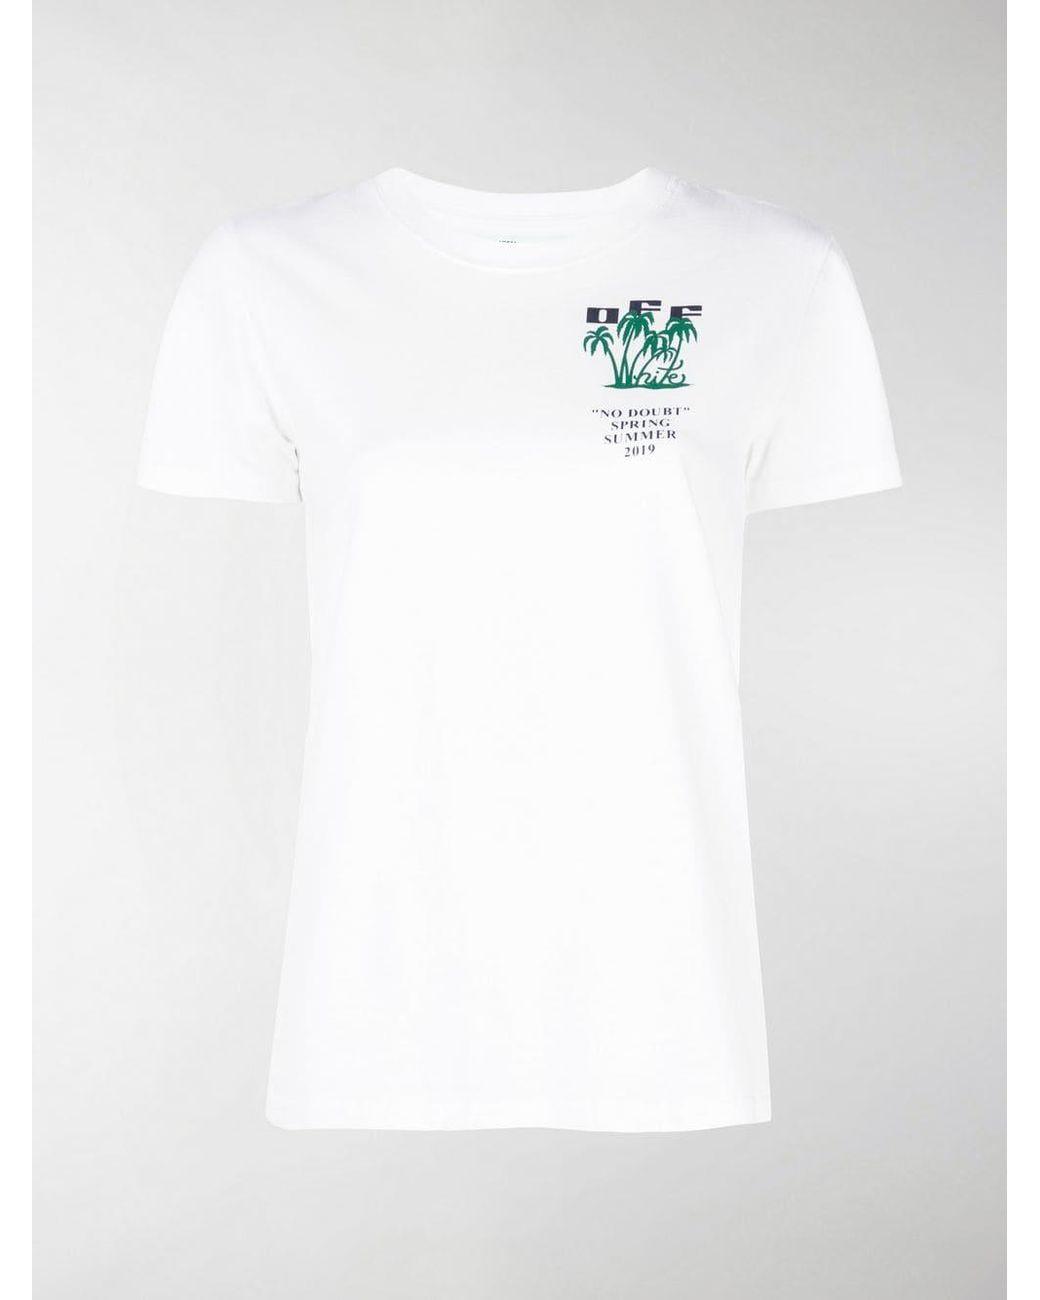 422ed23472d5 Off-White c o Virgil Abloh Graphic Print T-shirt in White - Lyst